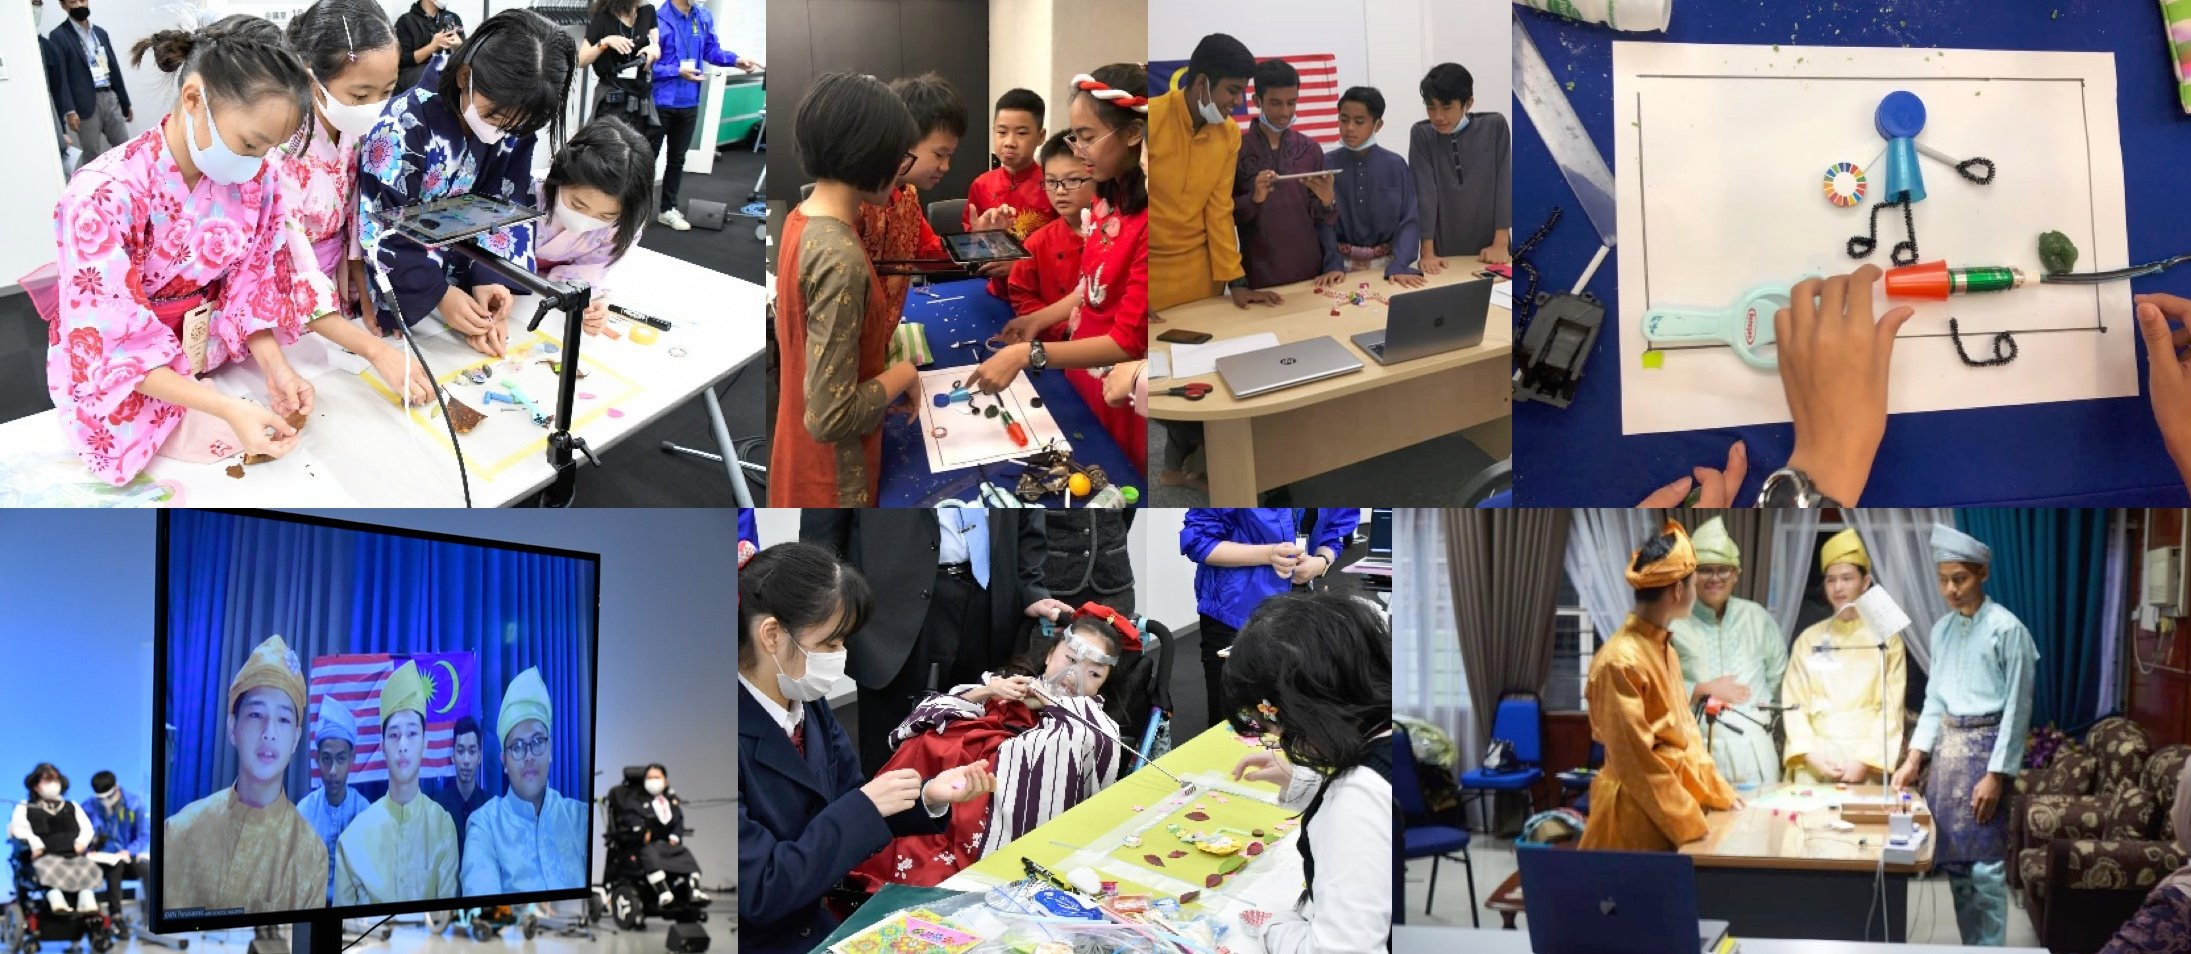 Photo: The Kid Witness News Global Summit 2020